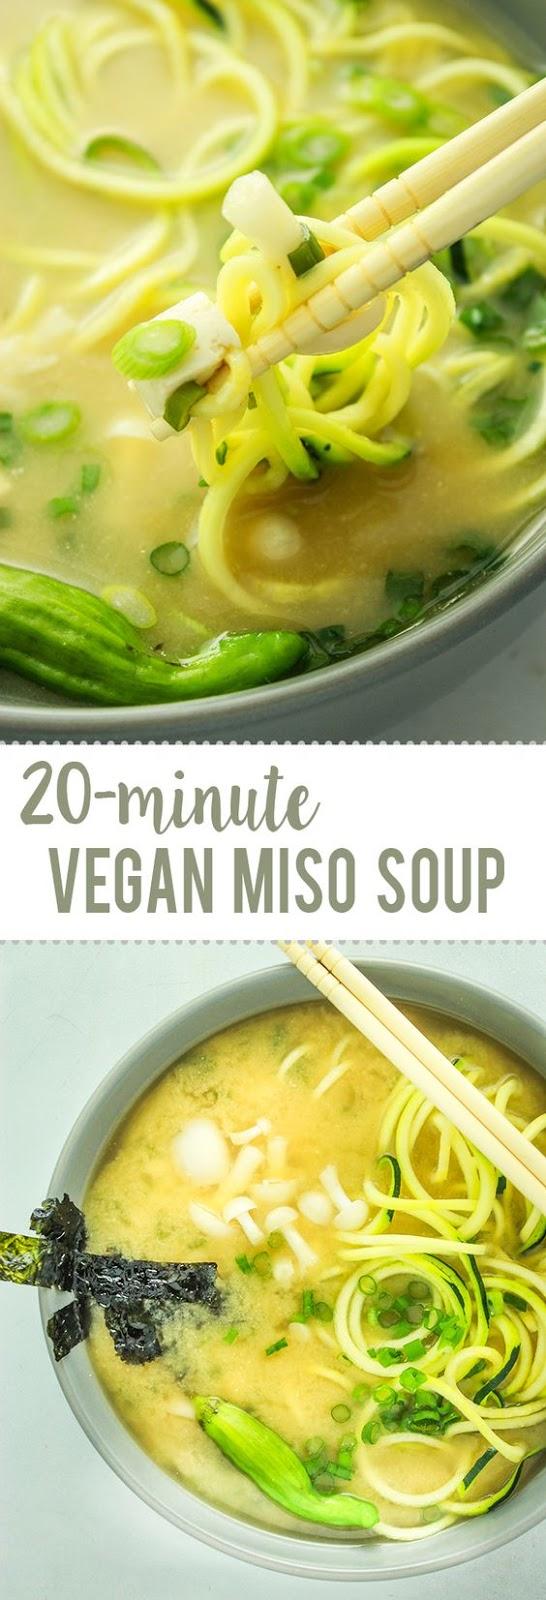 Easy Vegan Miso Soup #easyveganrecipes #vegan #veganrecipes #miso #soup #misosoup #souprecipes